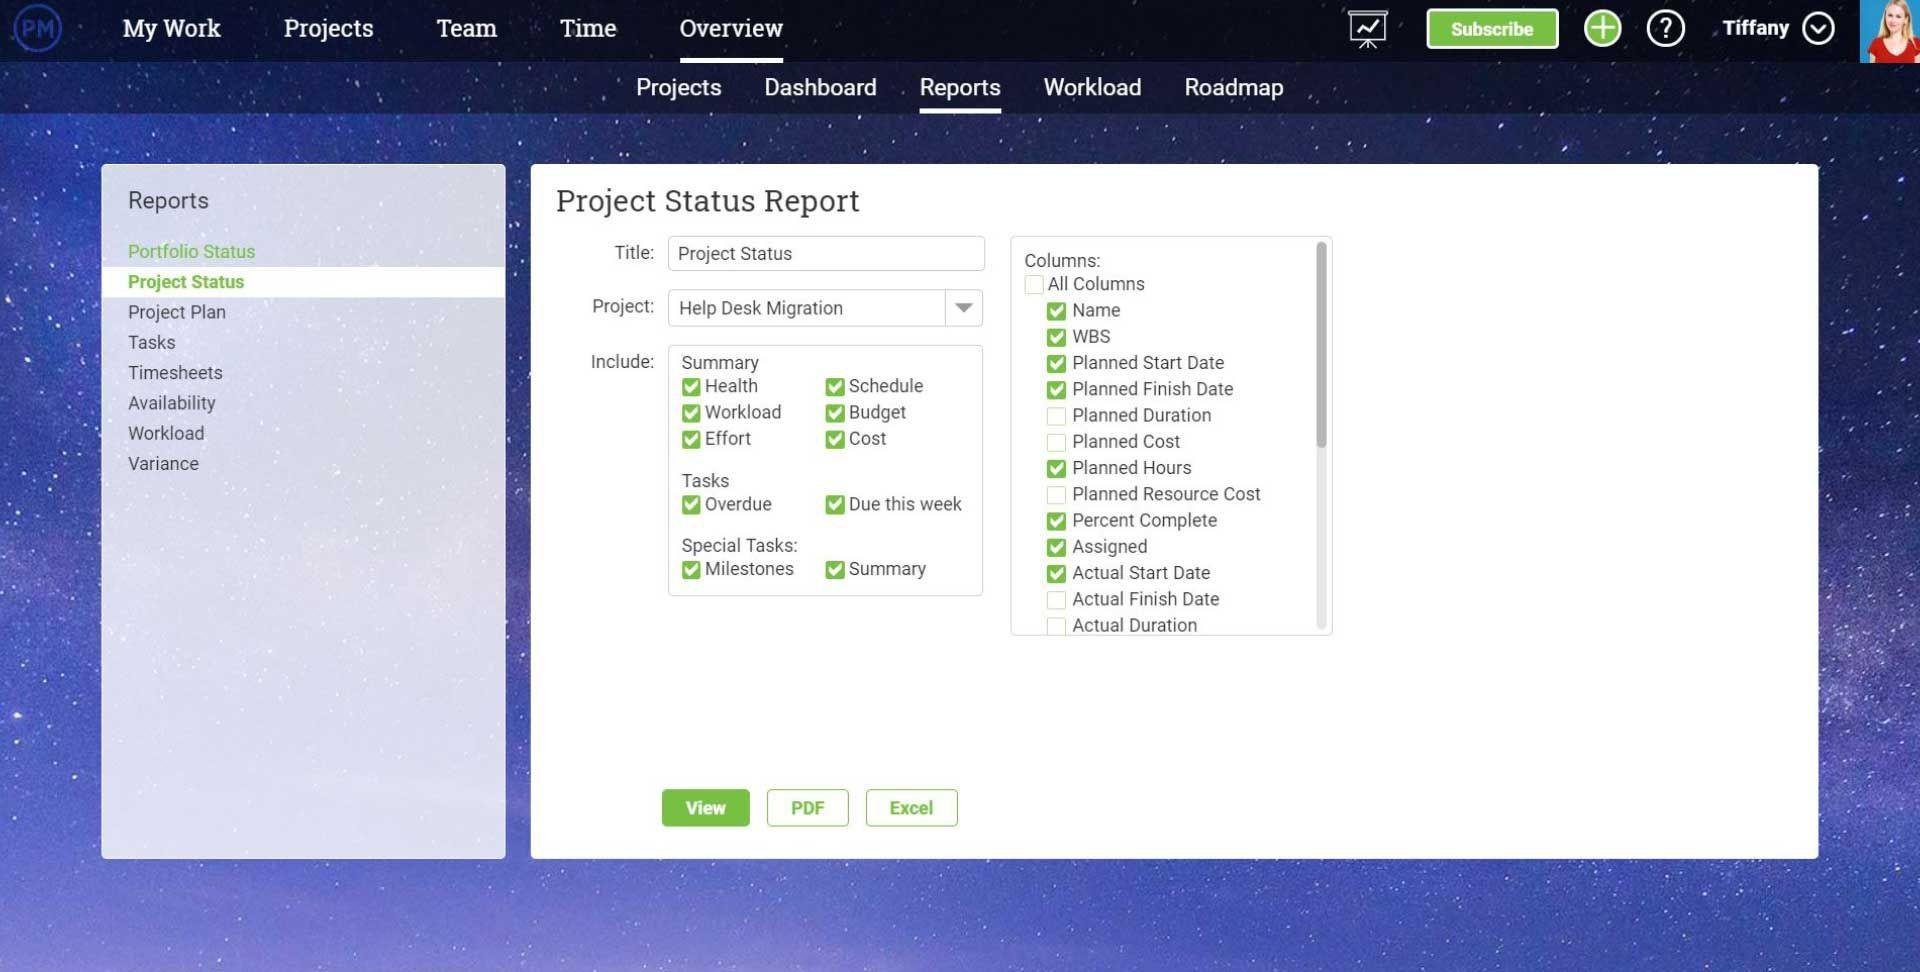 004 Staggering Project Management Statu Report Template Excel Concept  Gantt 2016 Progres1920